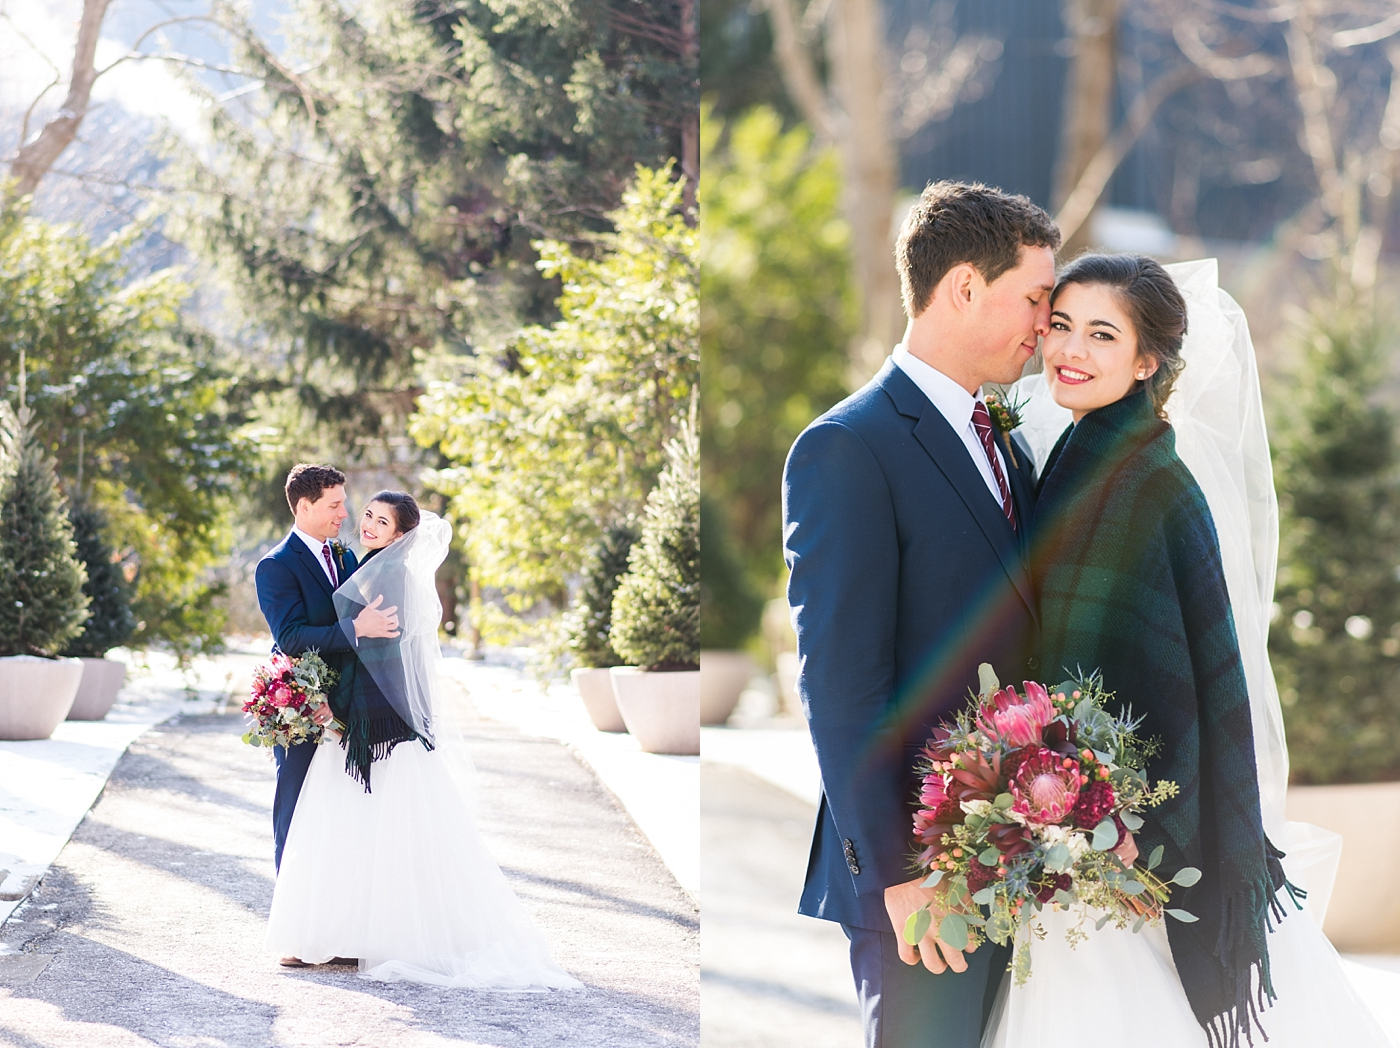 indianapolis-top-rated-wedding-photographers_0430.jpg